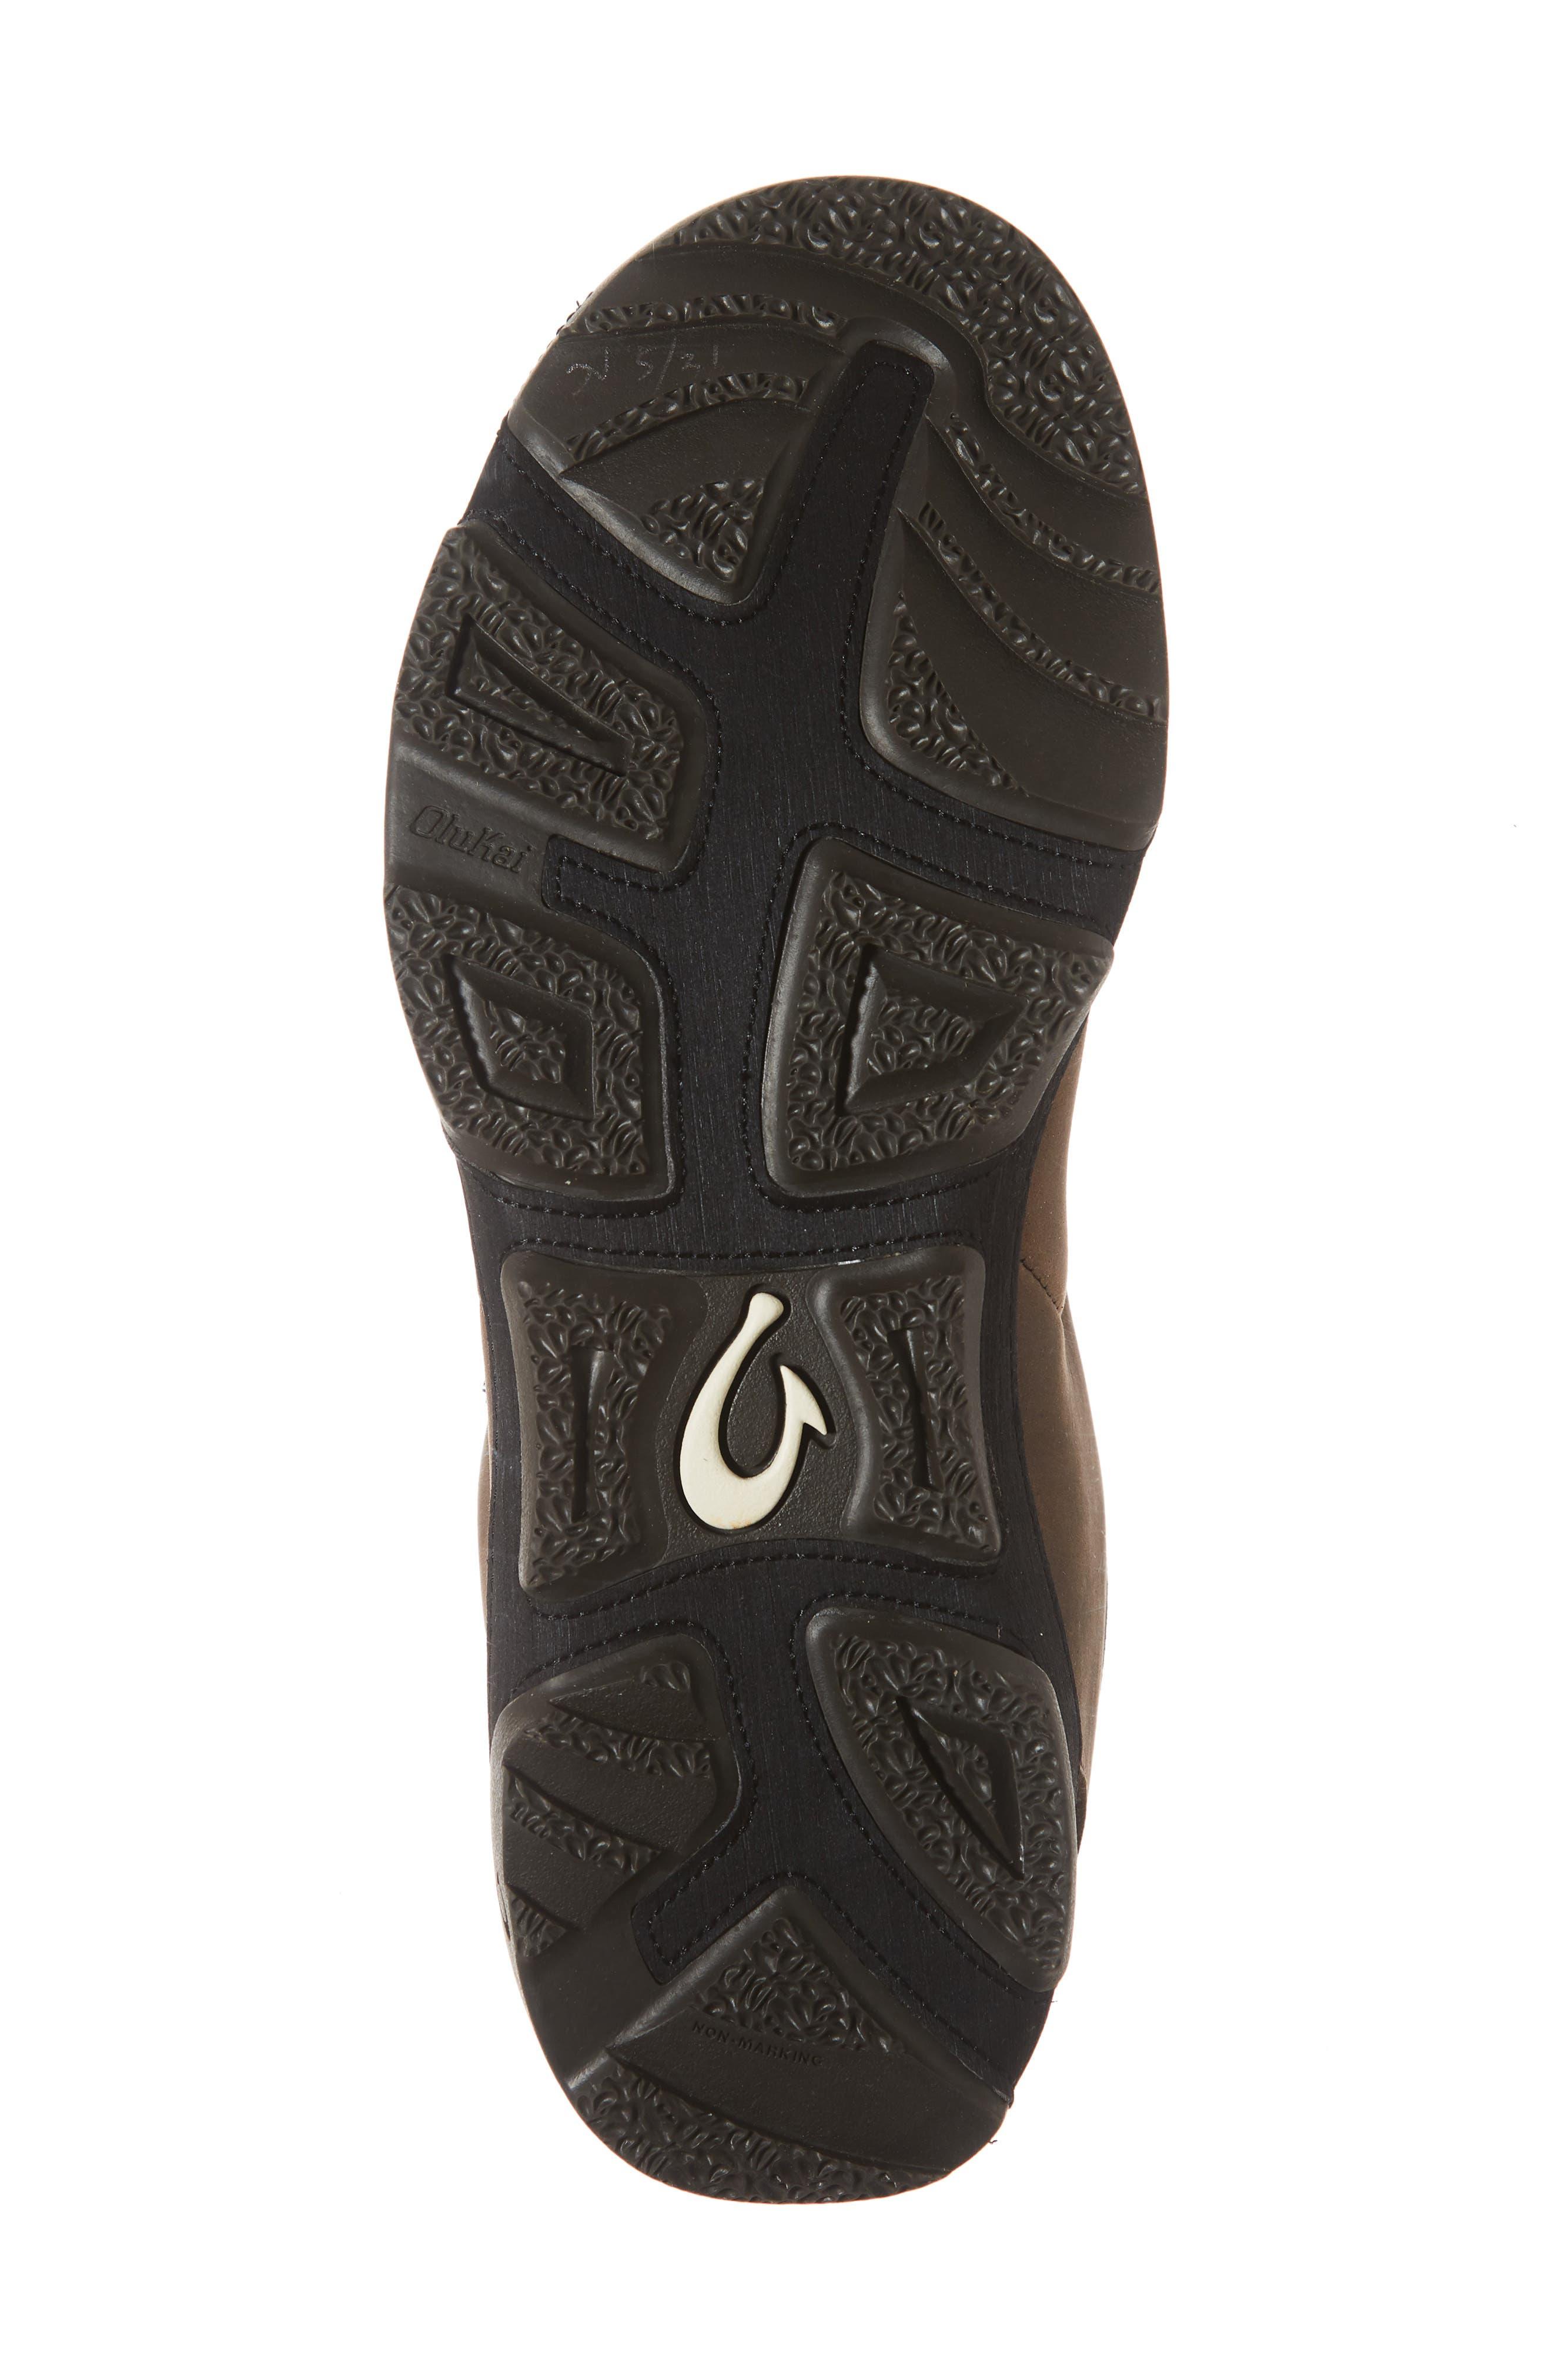 Makoa Waterproof Shoe,                             Alternate thumbnail 6, color,                             ESPRESSO/ BLACK LEATHER